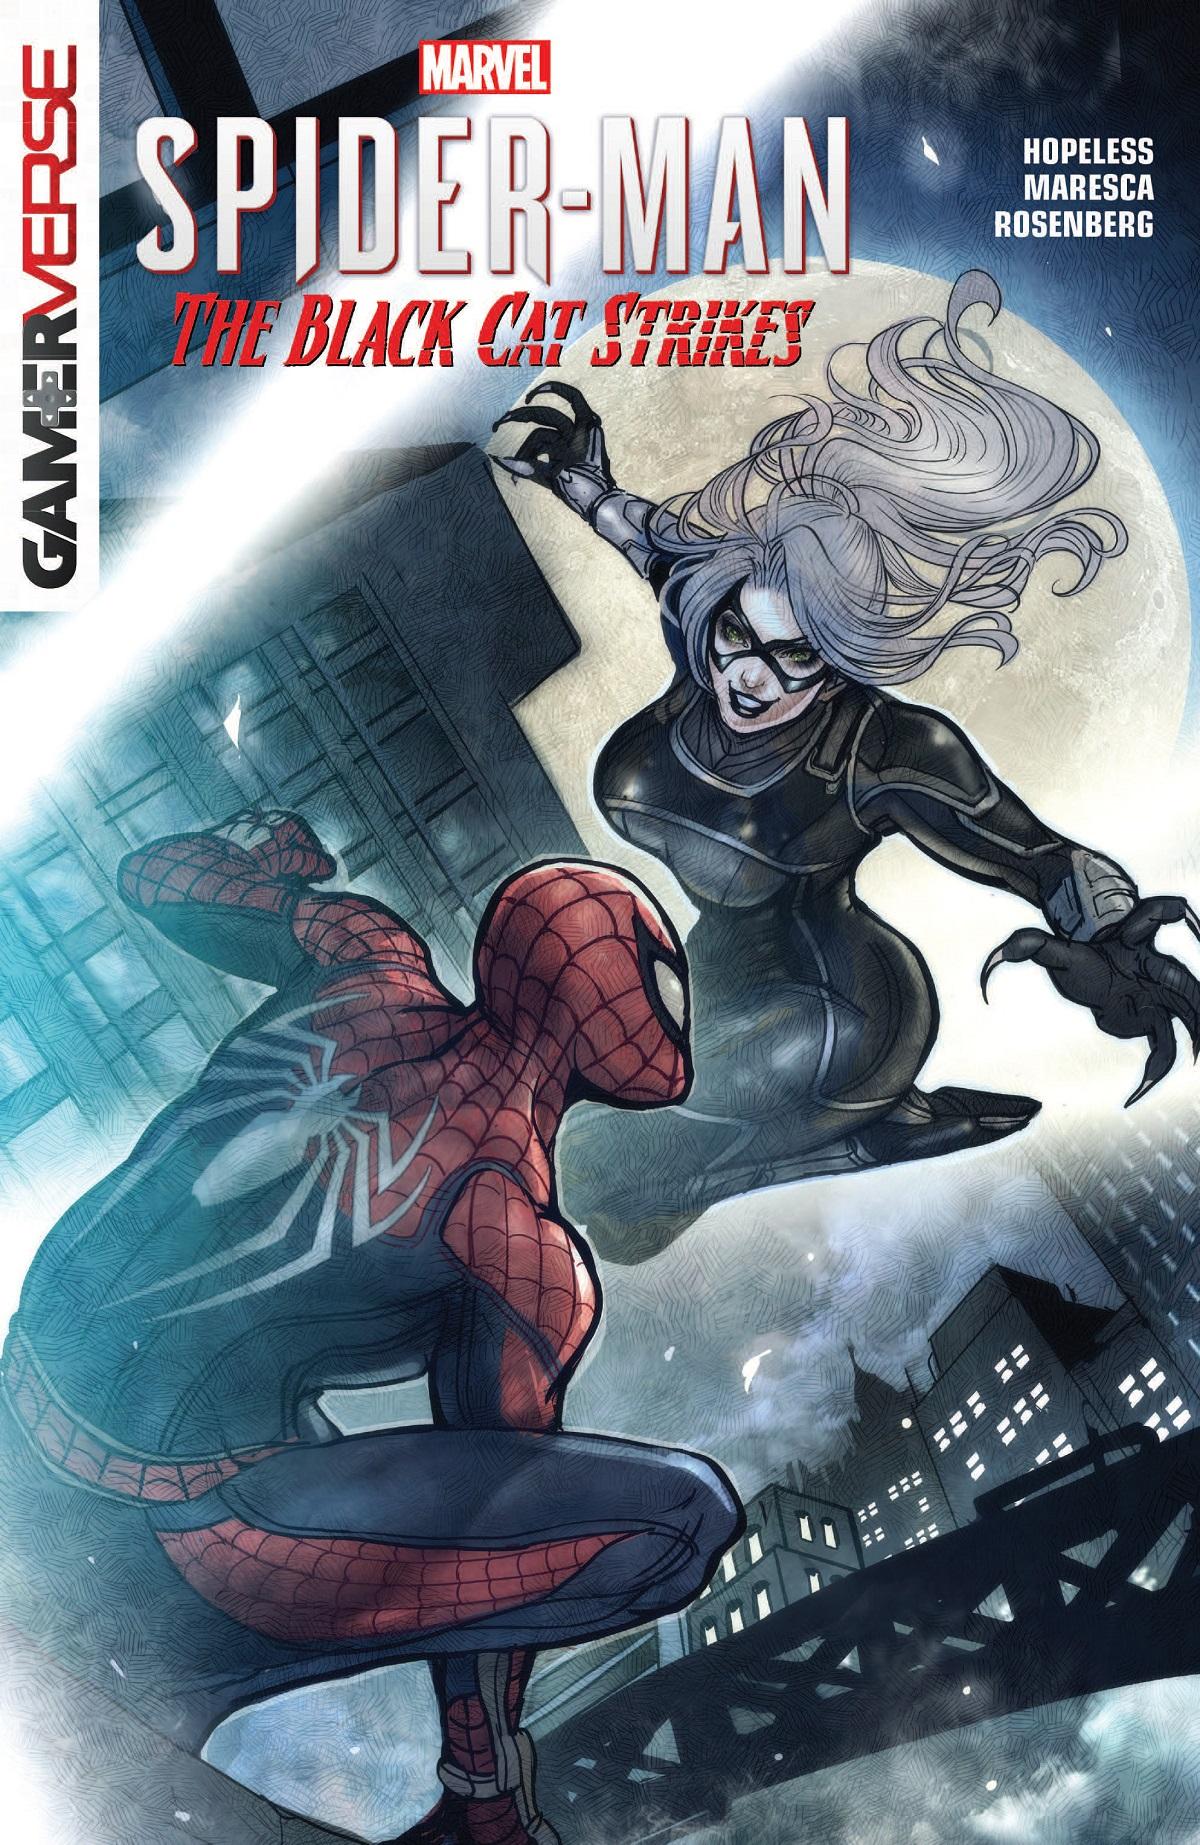 Marvel's Spider-Man: The Black Cat Strikes (Trade Paperback)